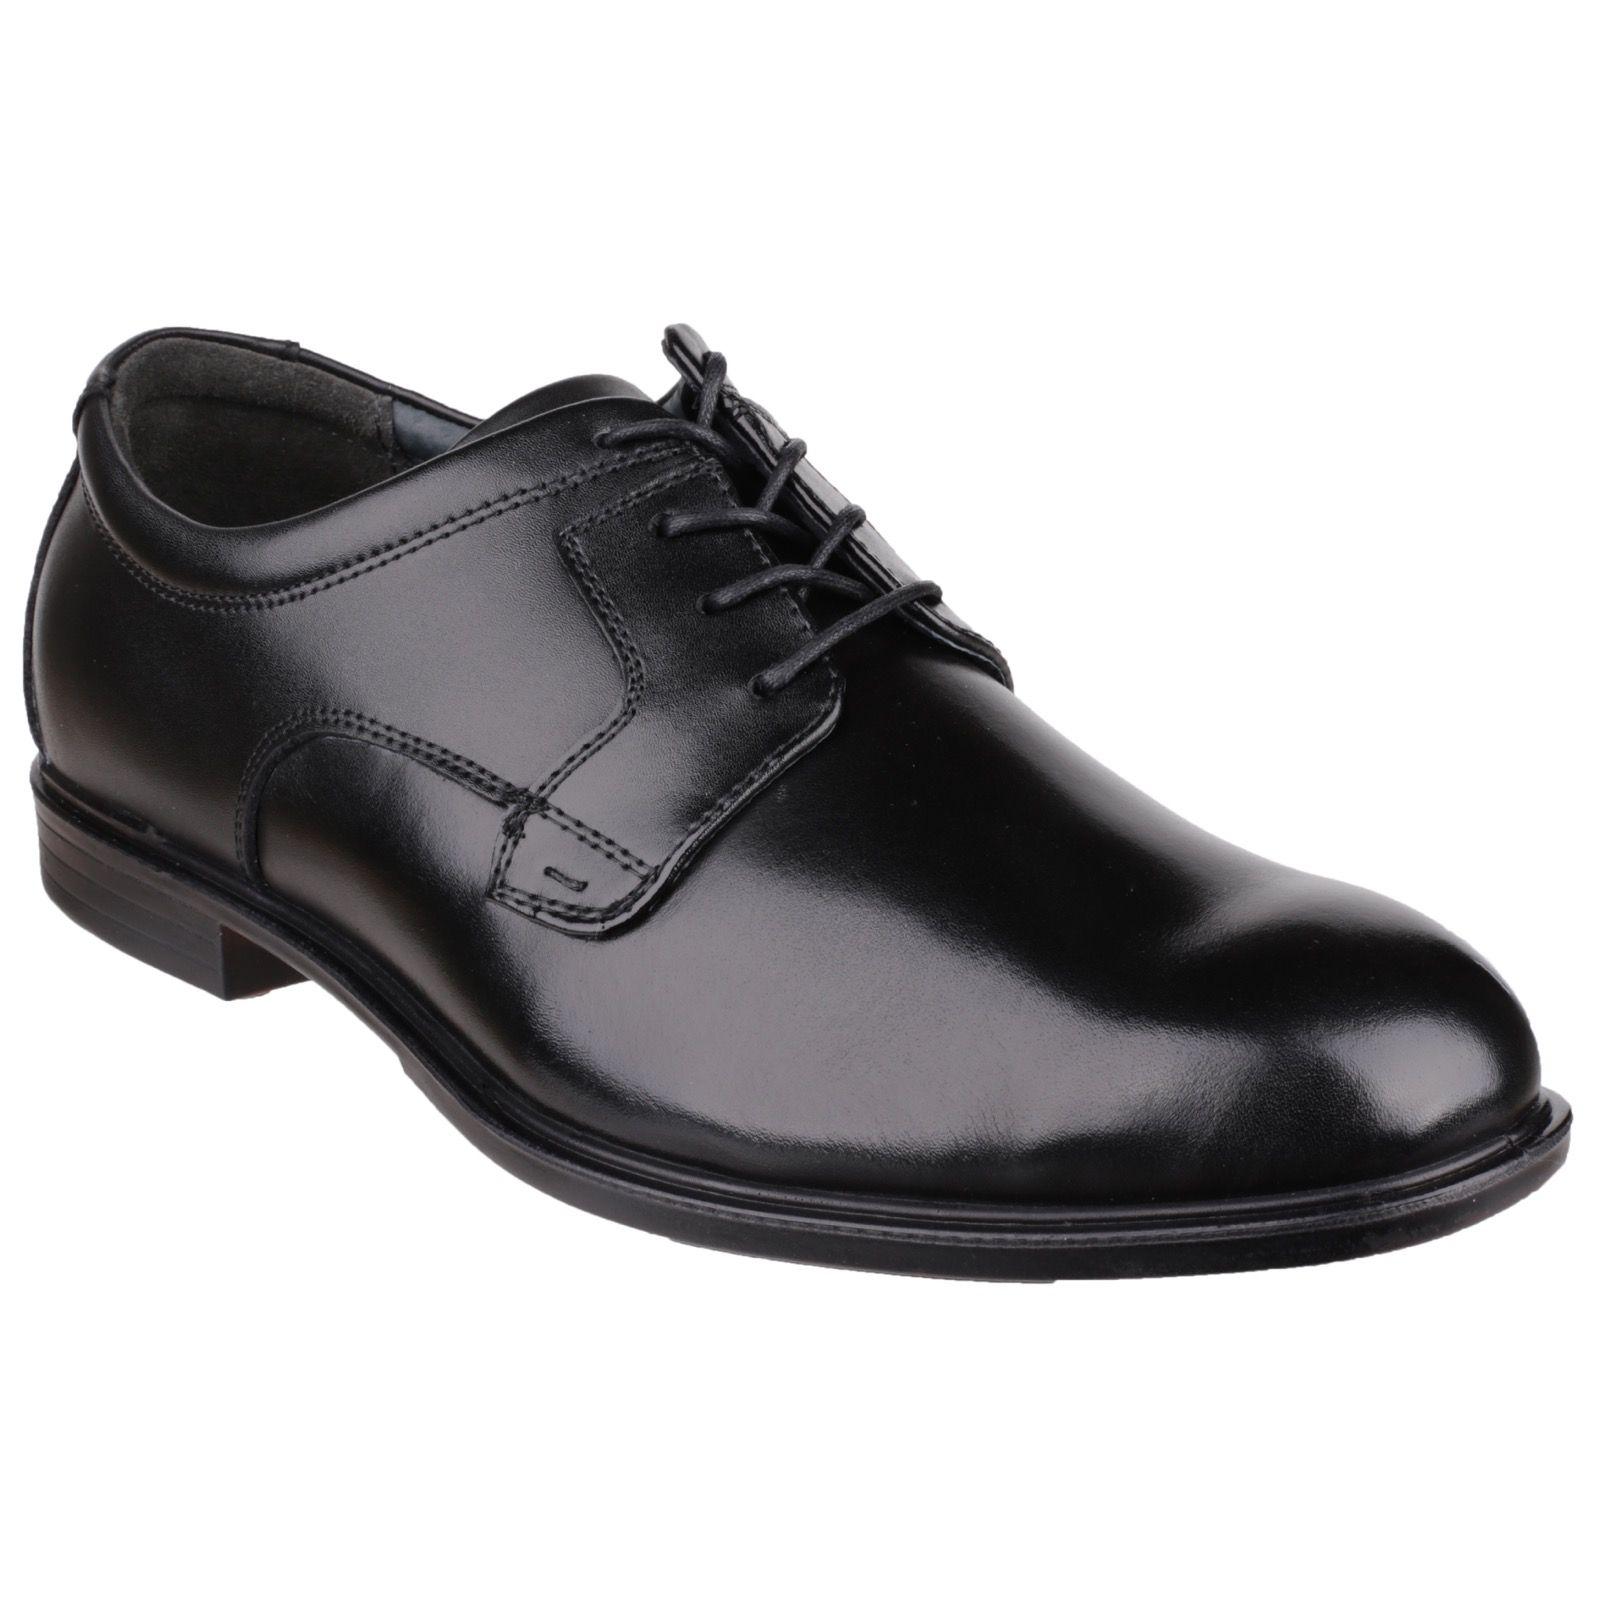 Mens Adidas Barratts shoes